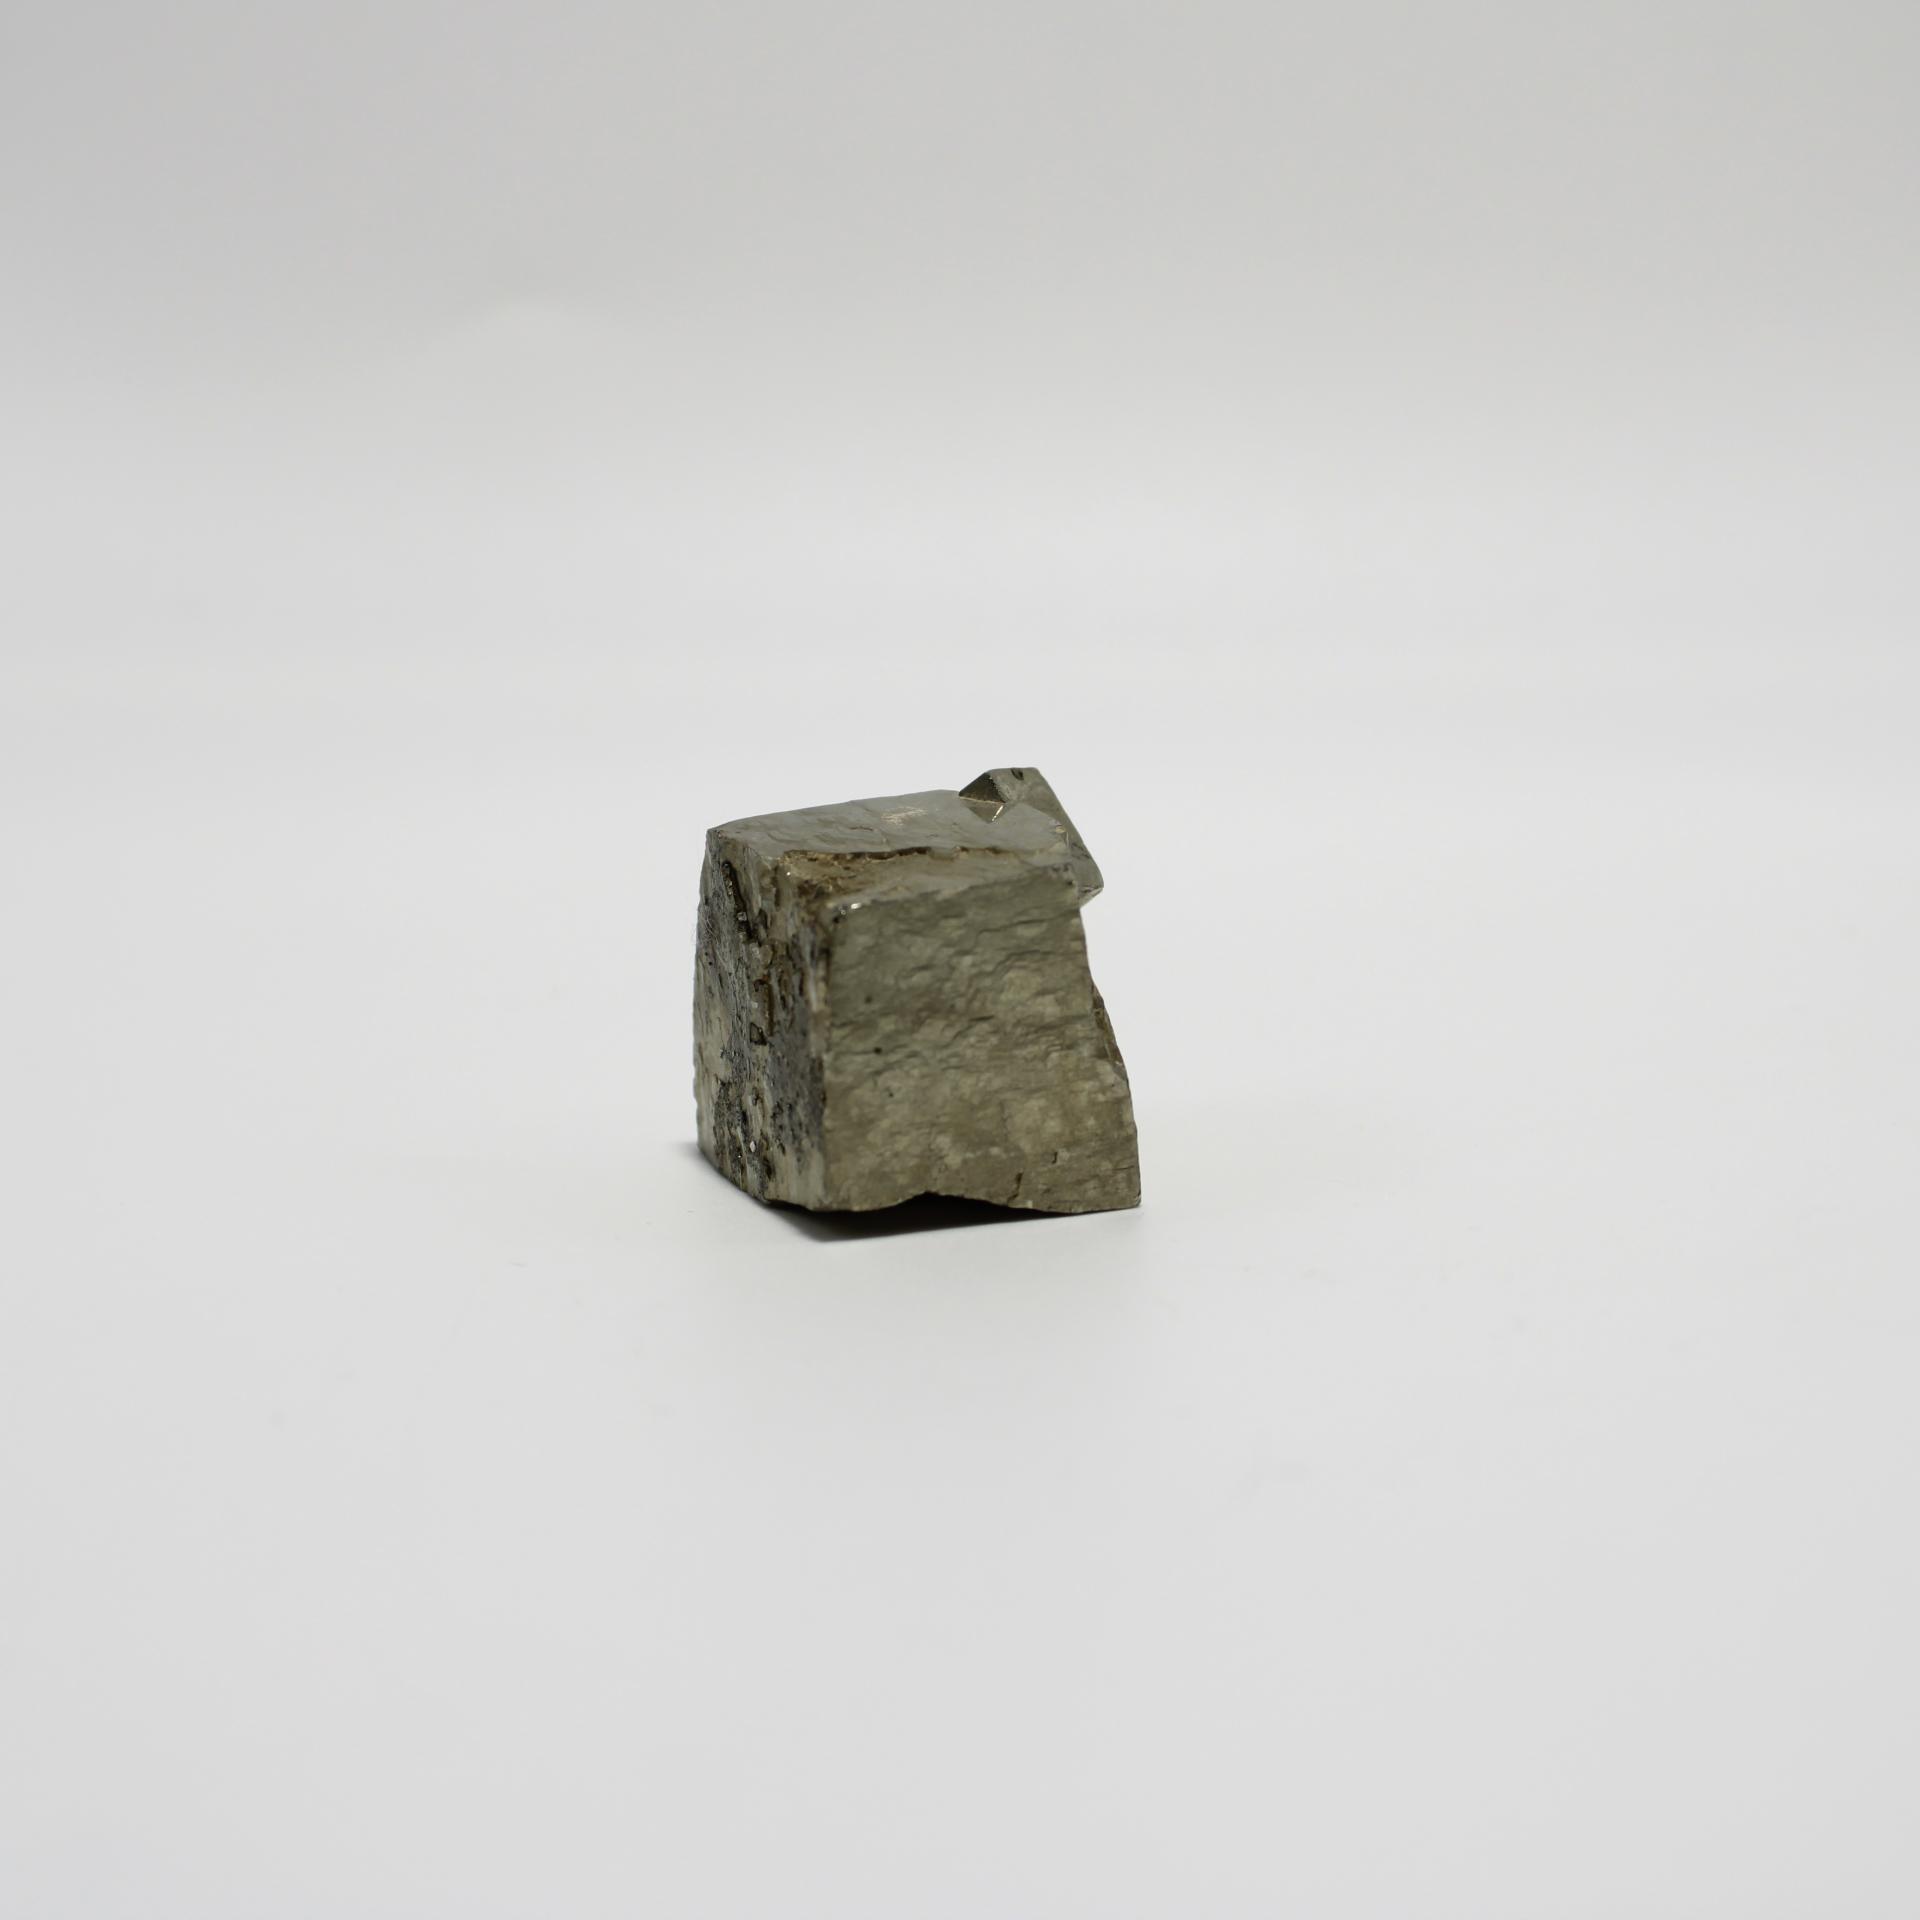 I82 pyritecube 3